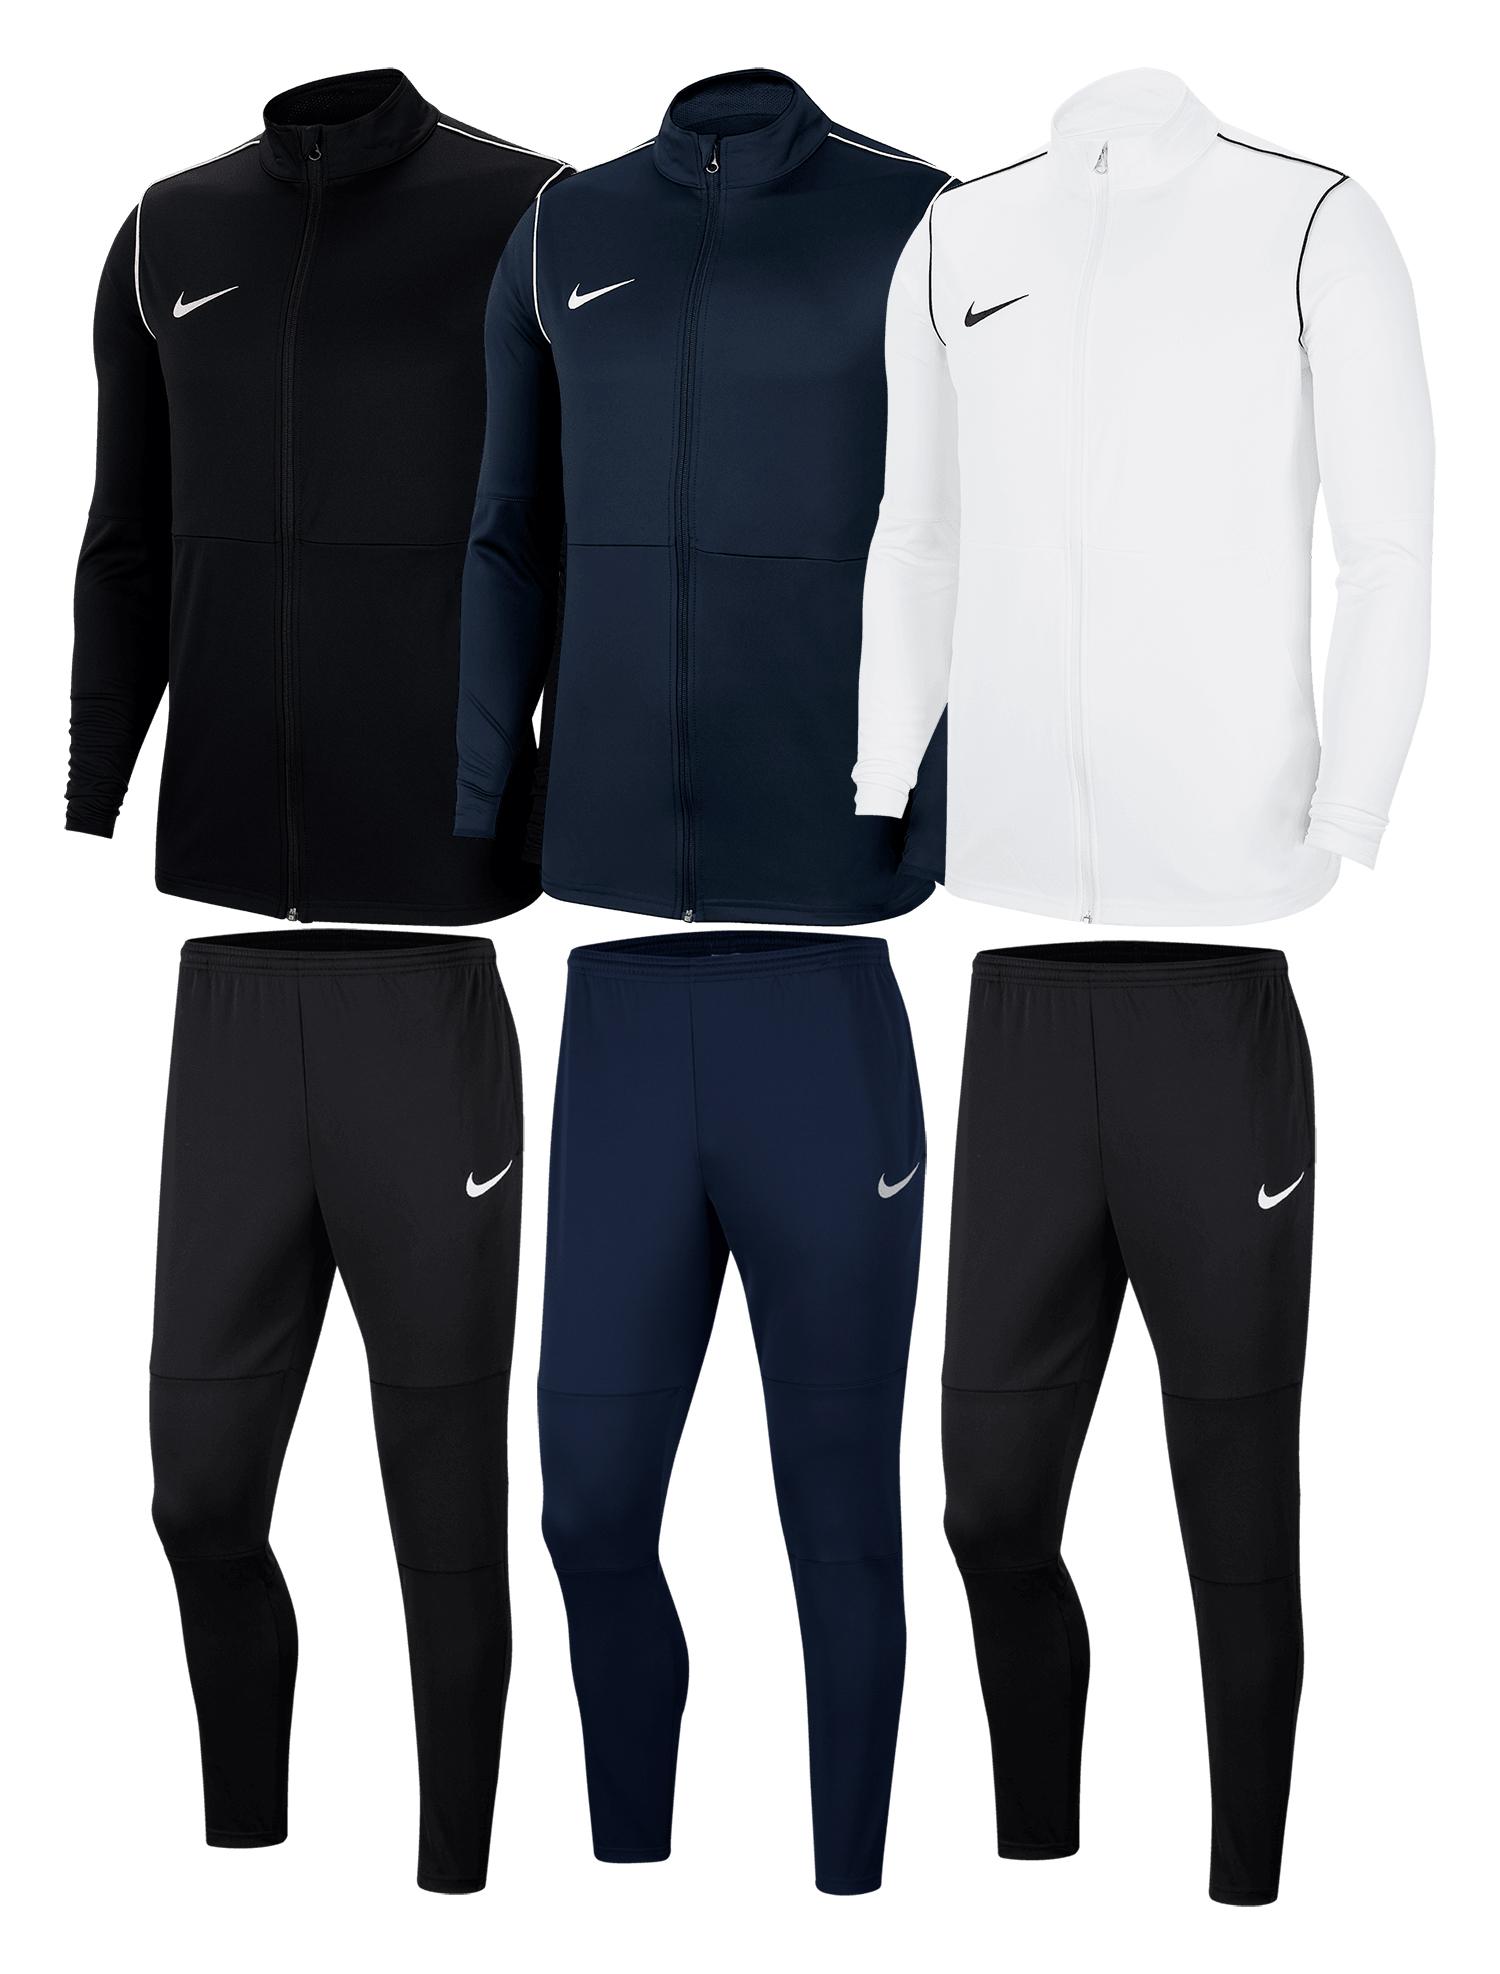 Nike Trainingsanzug Park 20 (Größen S bis XL)